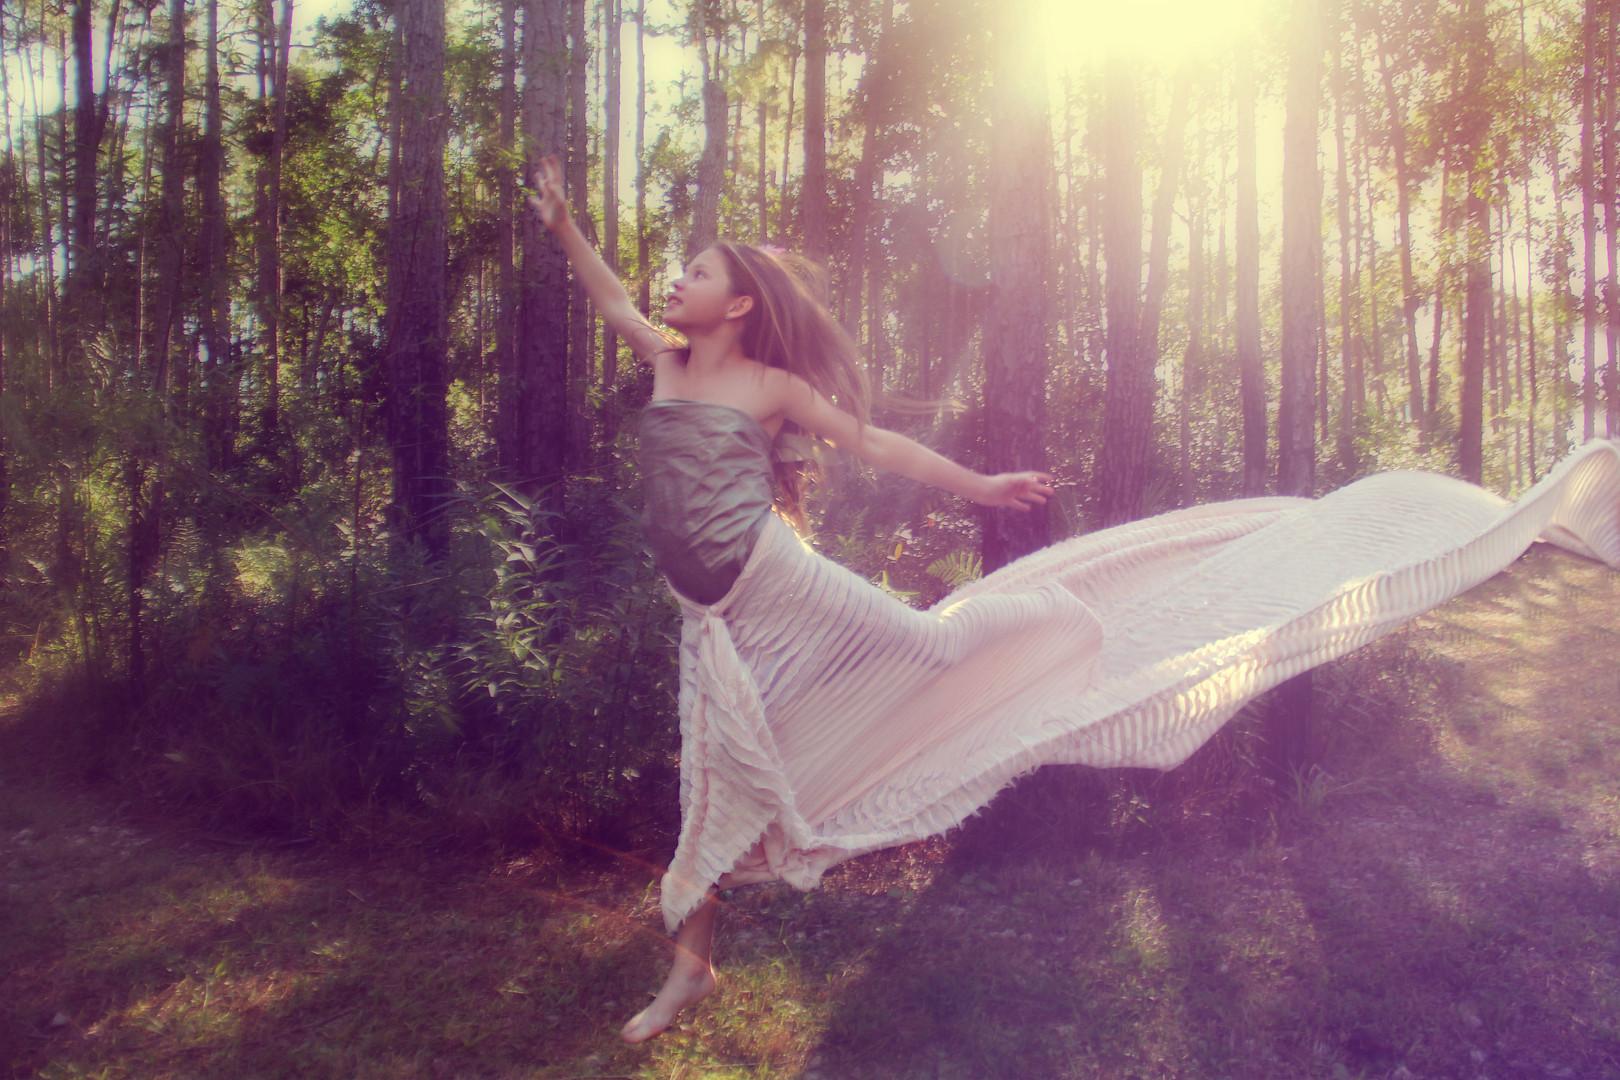 sophia leap stars_1.jpg